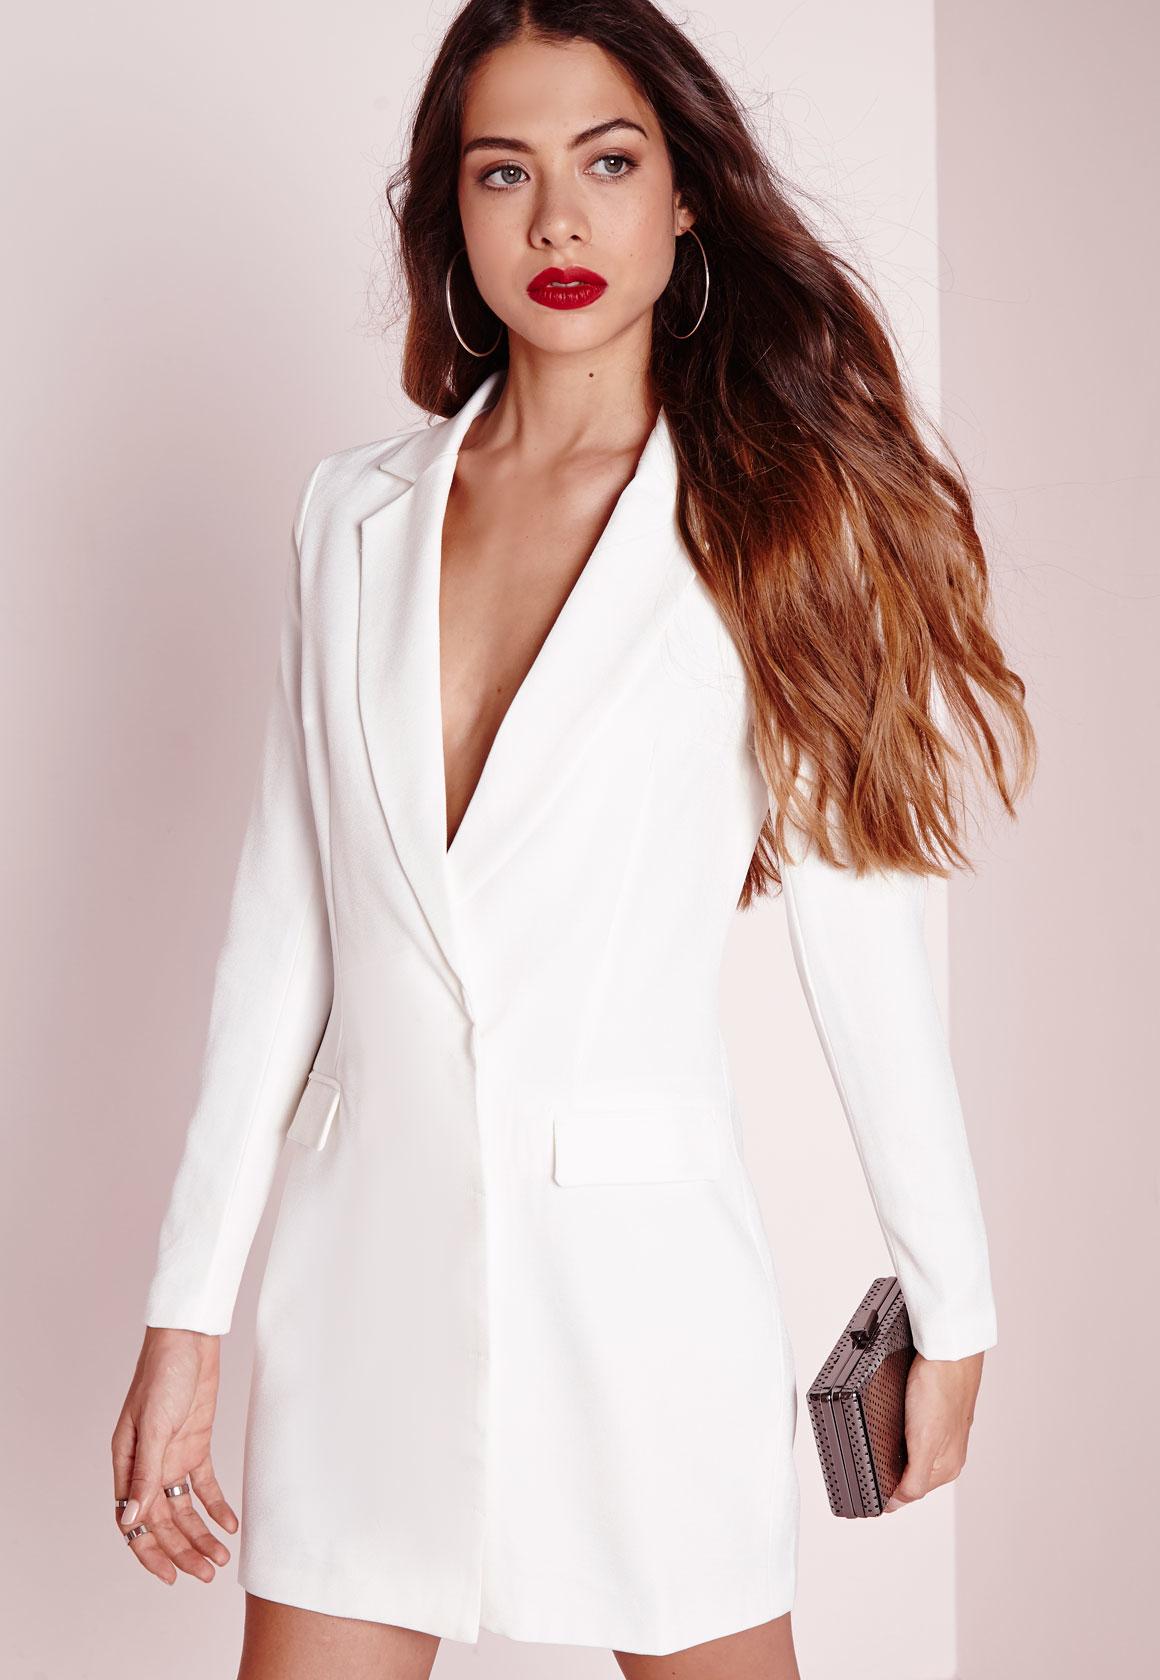 08c933977db1 Long White To | Kim Kardashian In White Crop Top And Pencil Skirt To ...